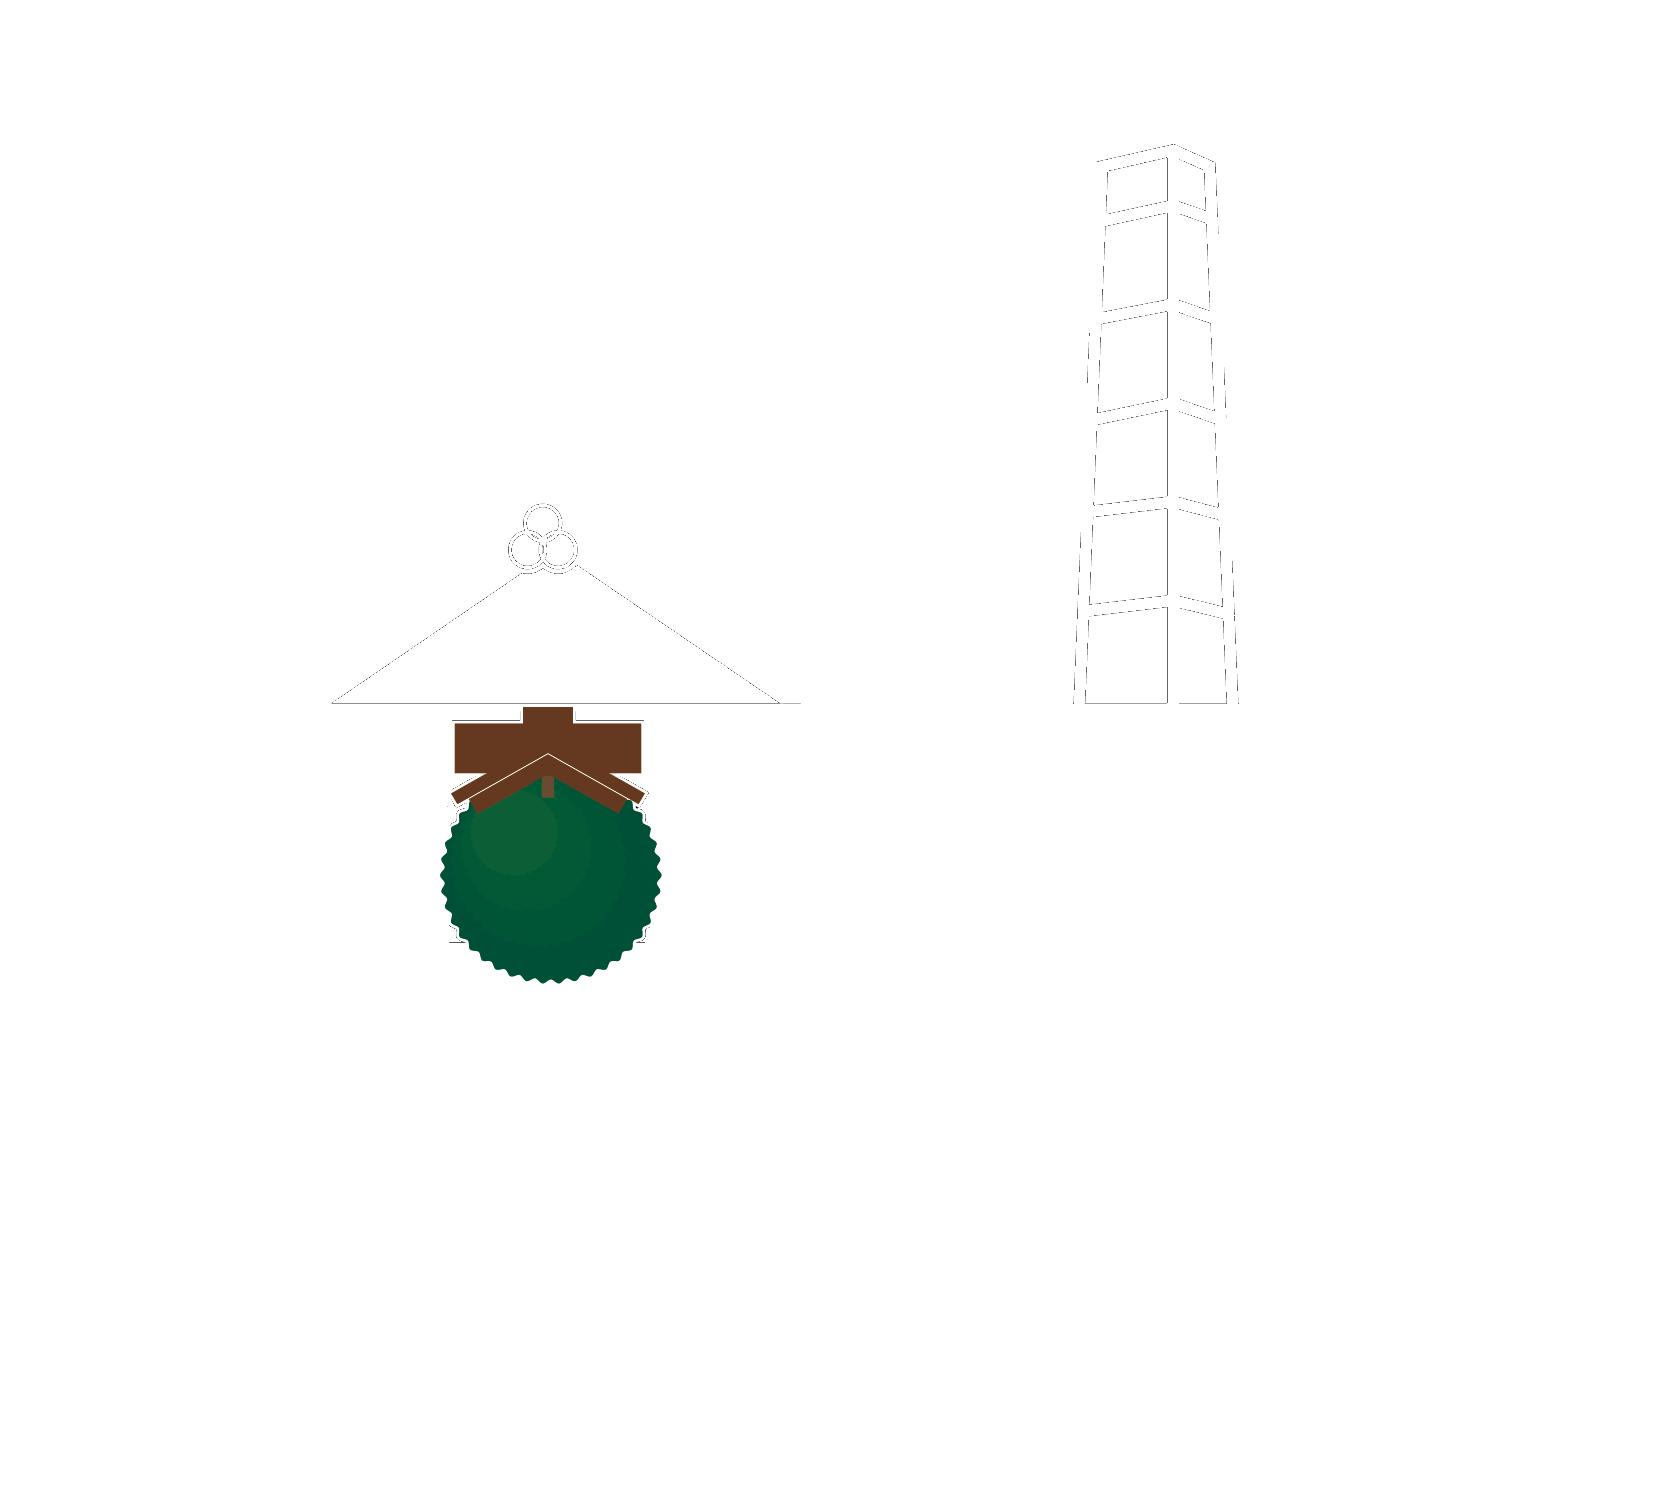 醸下町 松本 -JokaMachi Matsumoto-